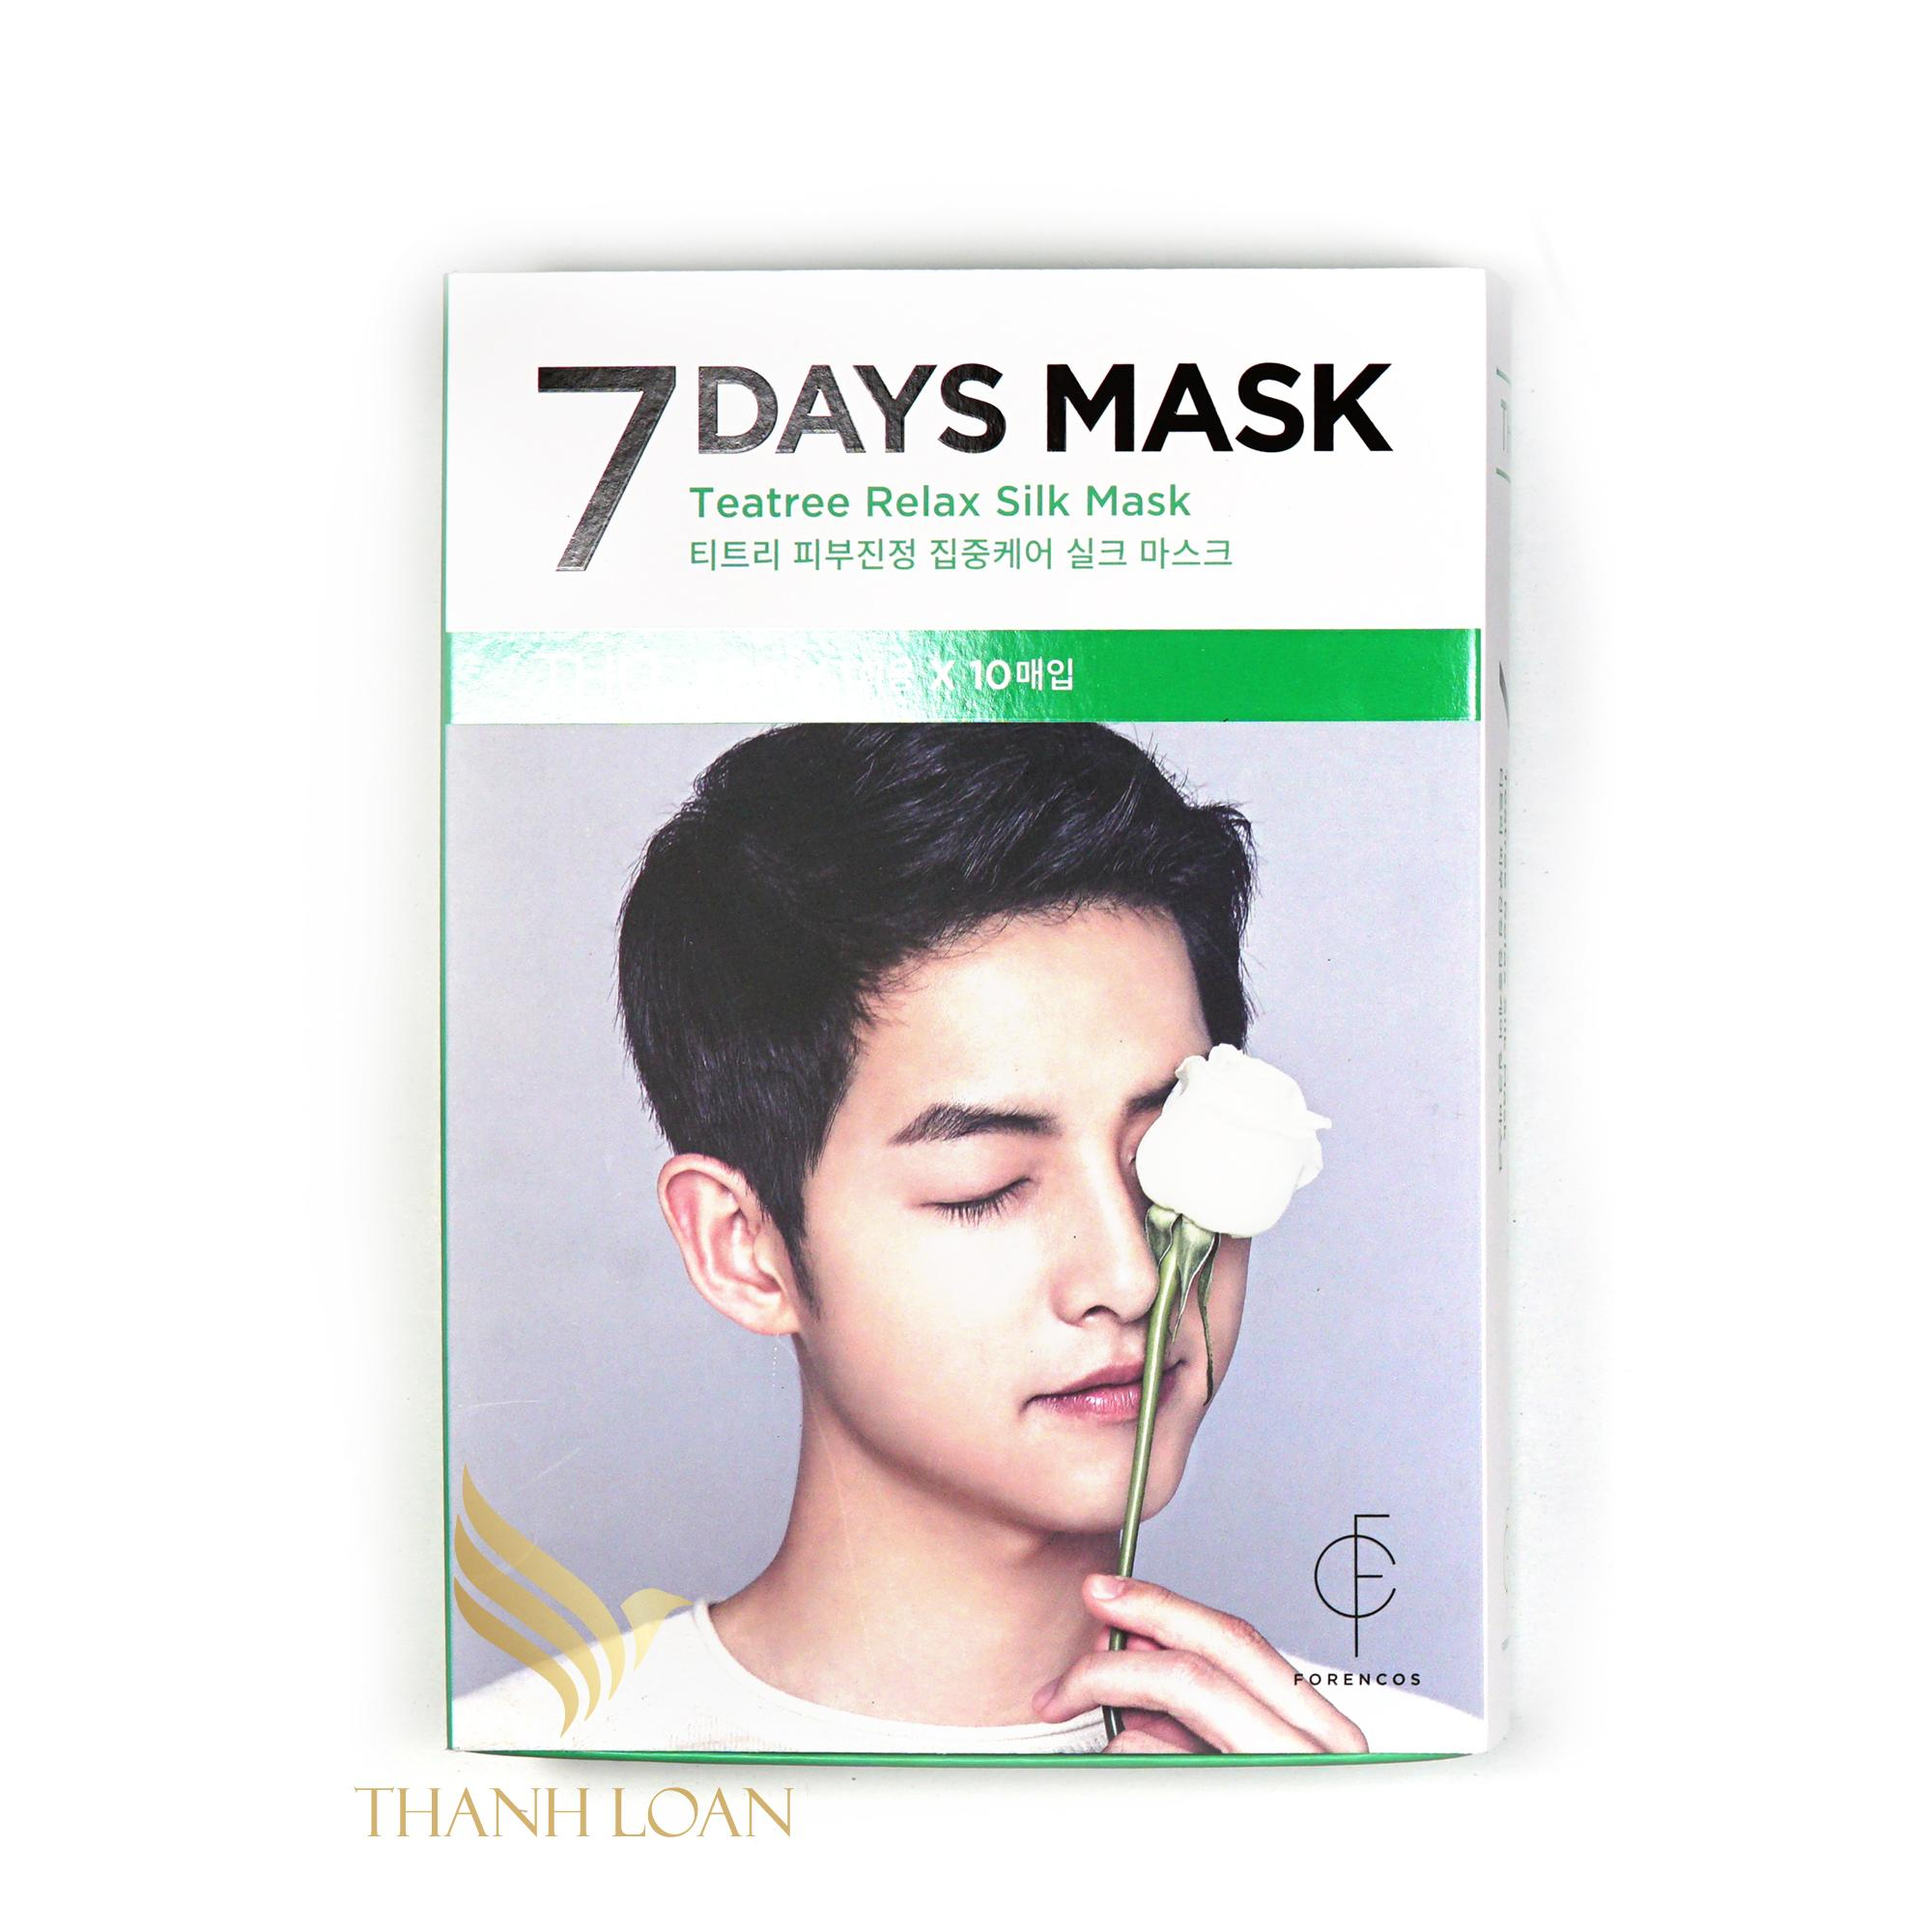 1 Mặt nạ FORENCOS 7 Days Mask ft Song Joong Ki - THURSDAY - Thanh Loan